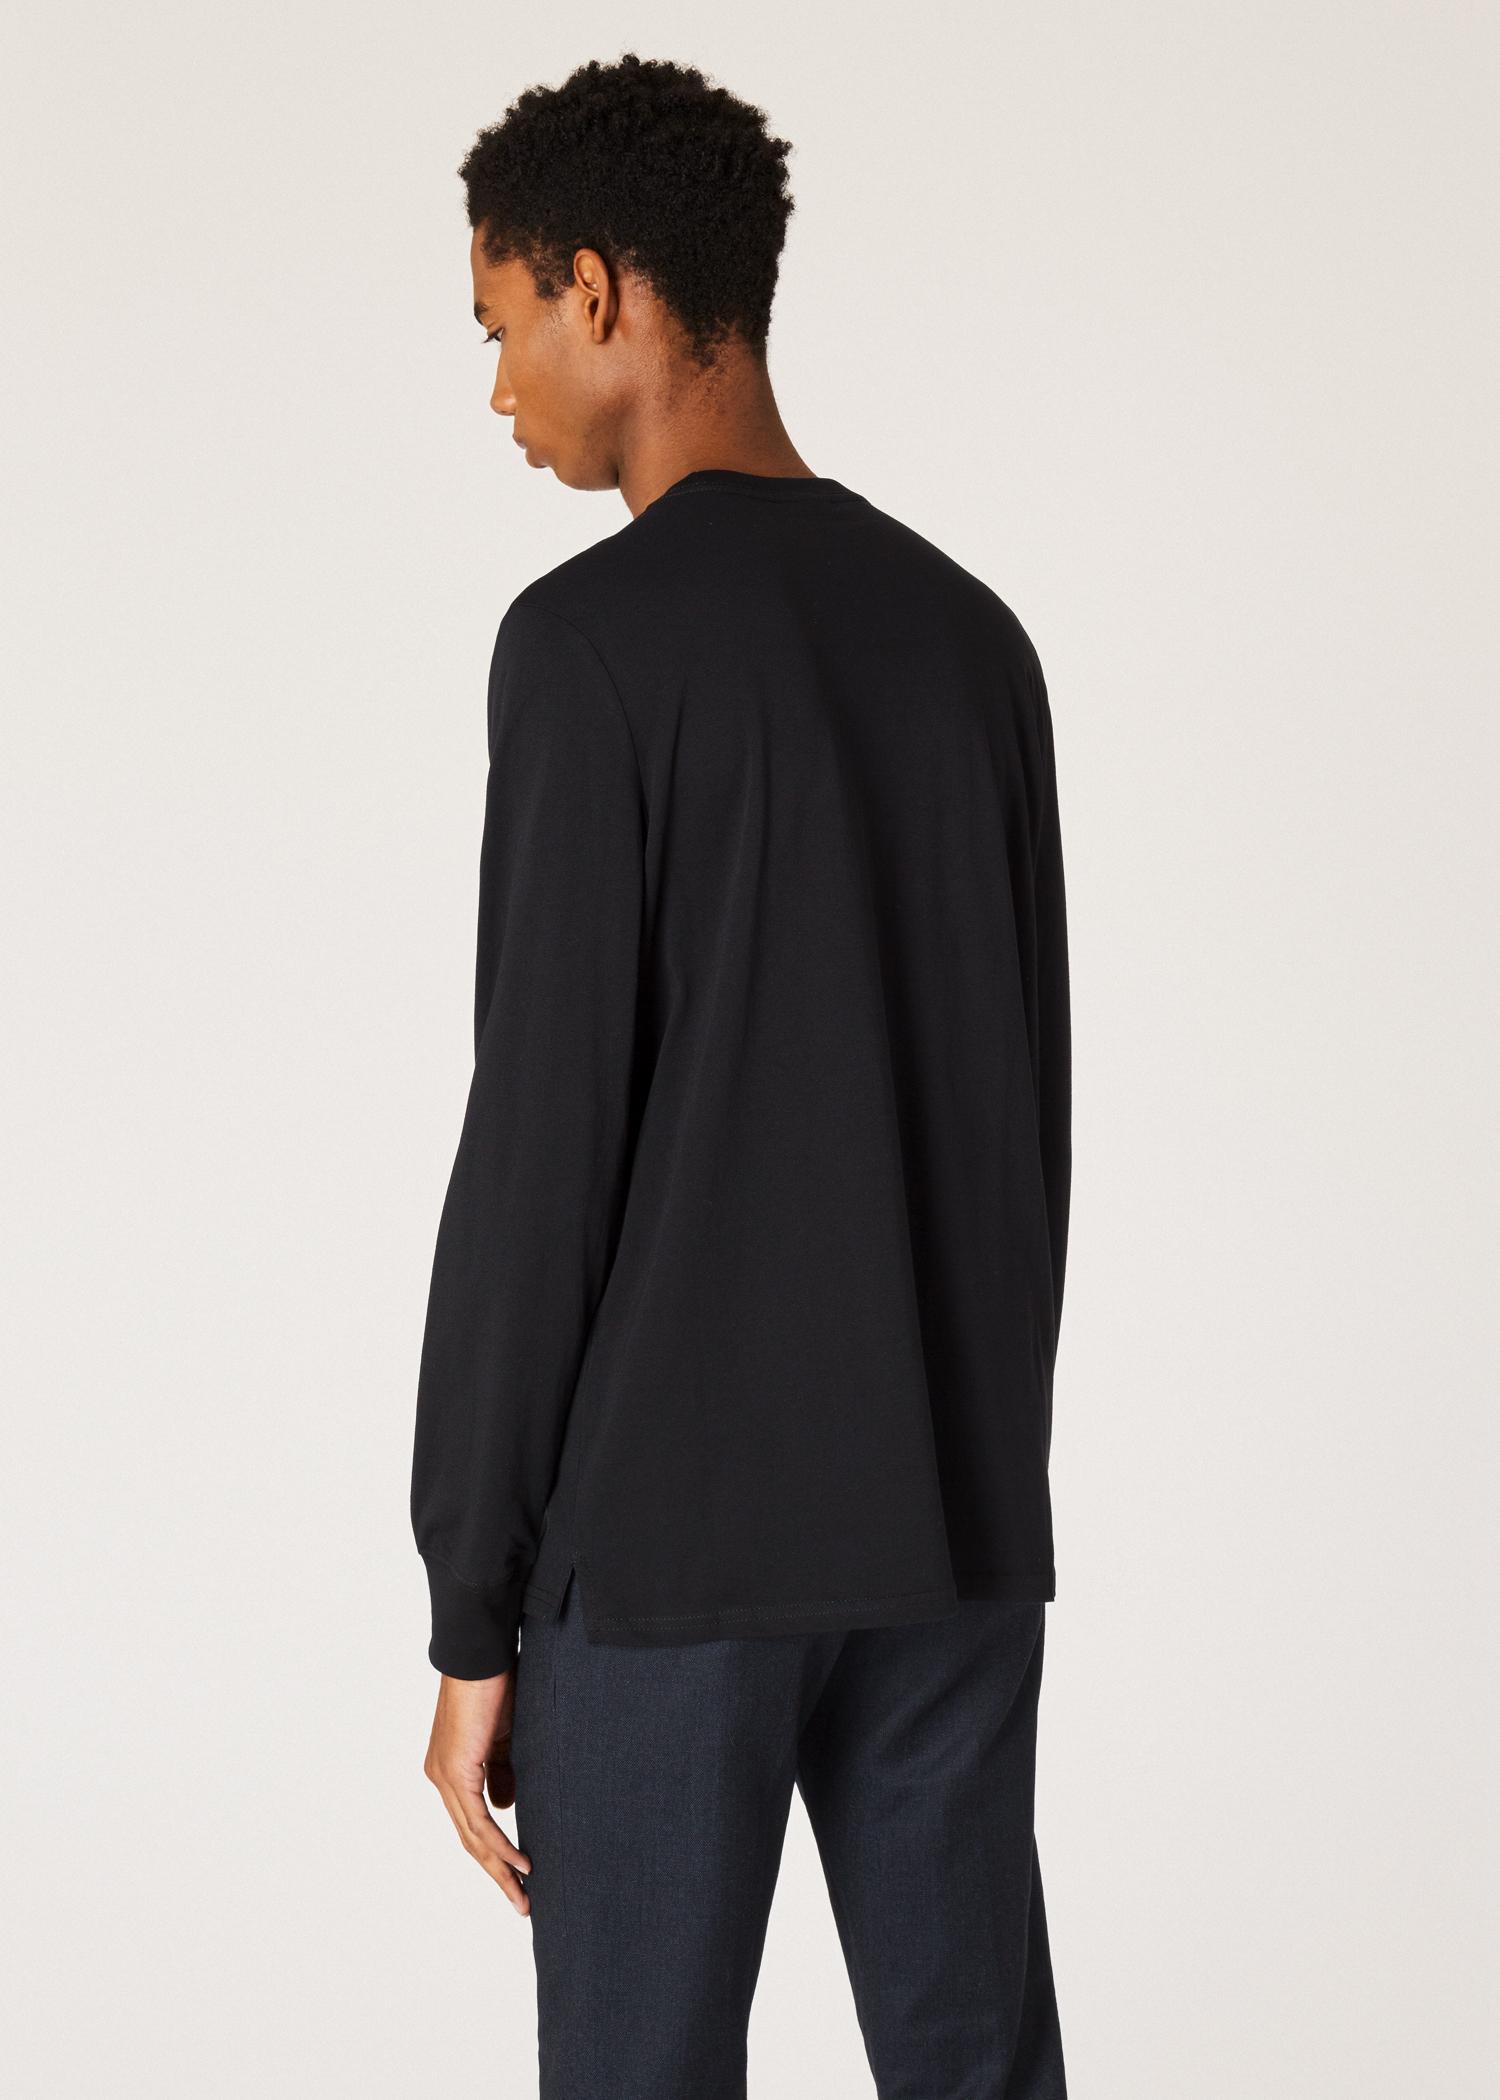 Men s Black Organic-Cotton Zebra Logo Long-Sleeve T-Shirt by Paul Smith c8da6f37a8a